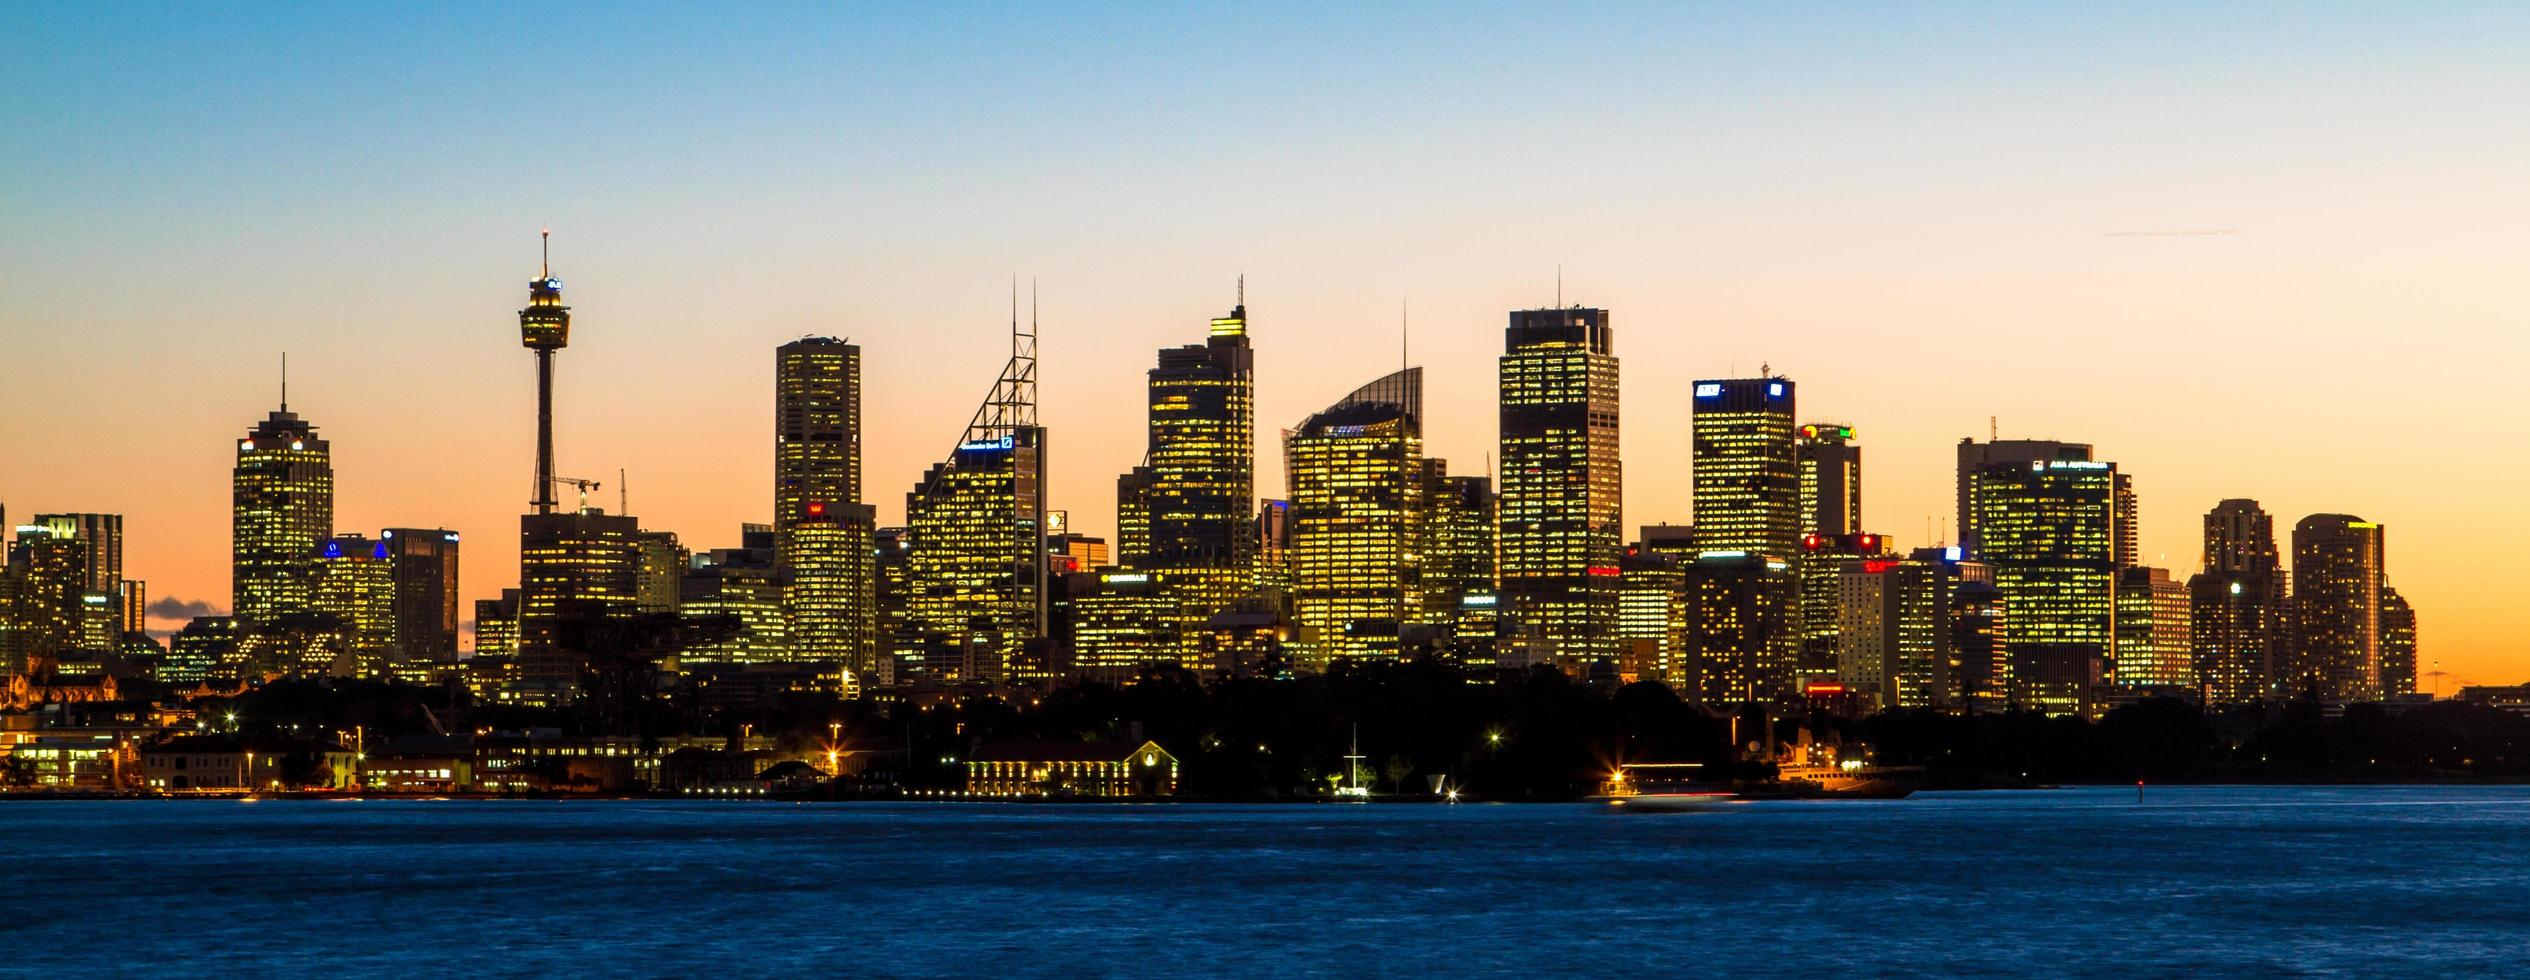 sydney, australië, 2020 - stadsgezicht bij zonsondergang foto